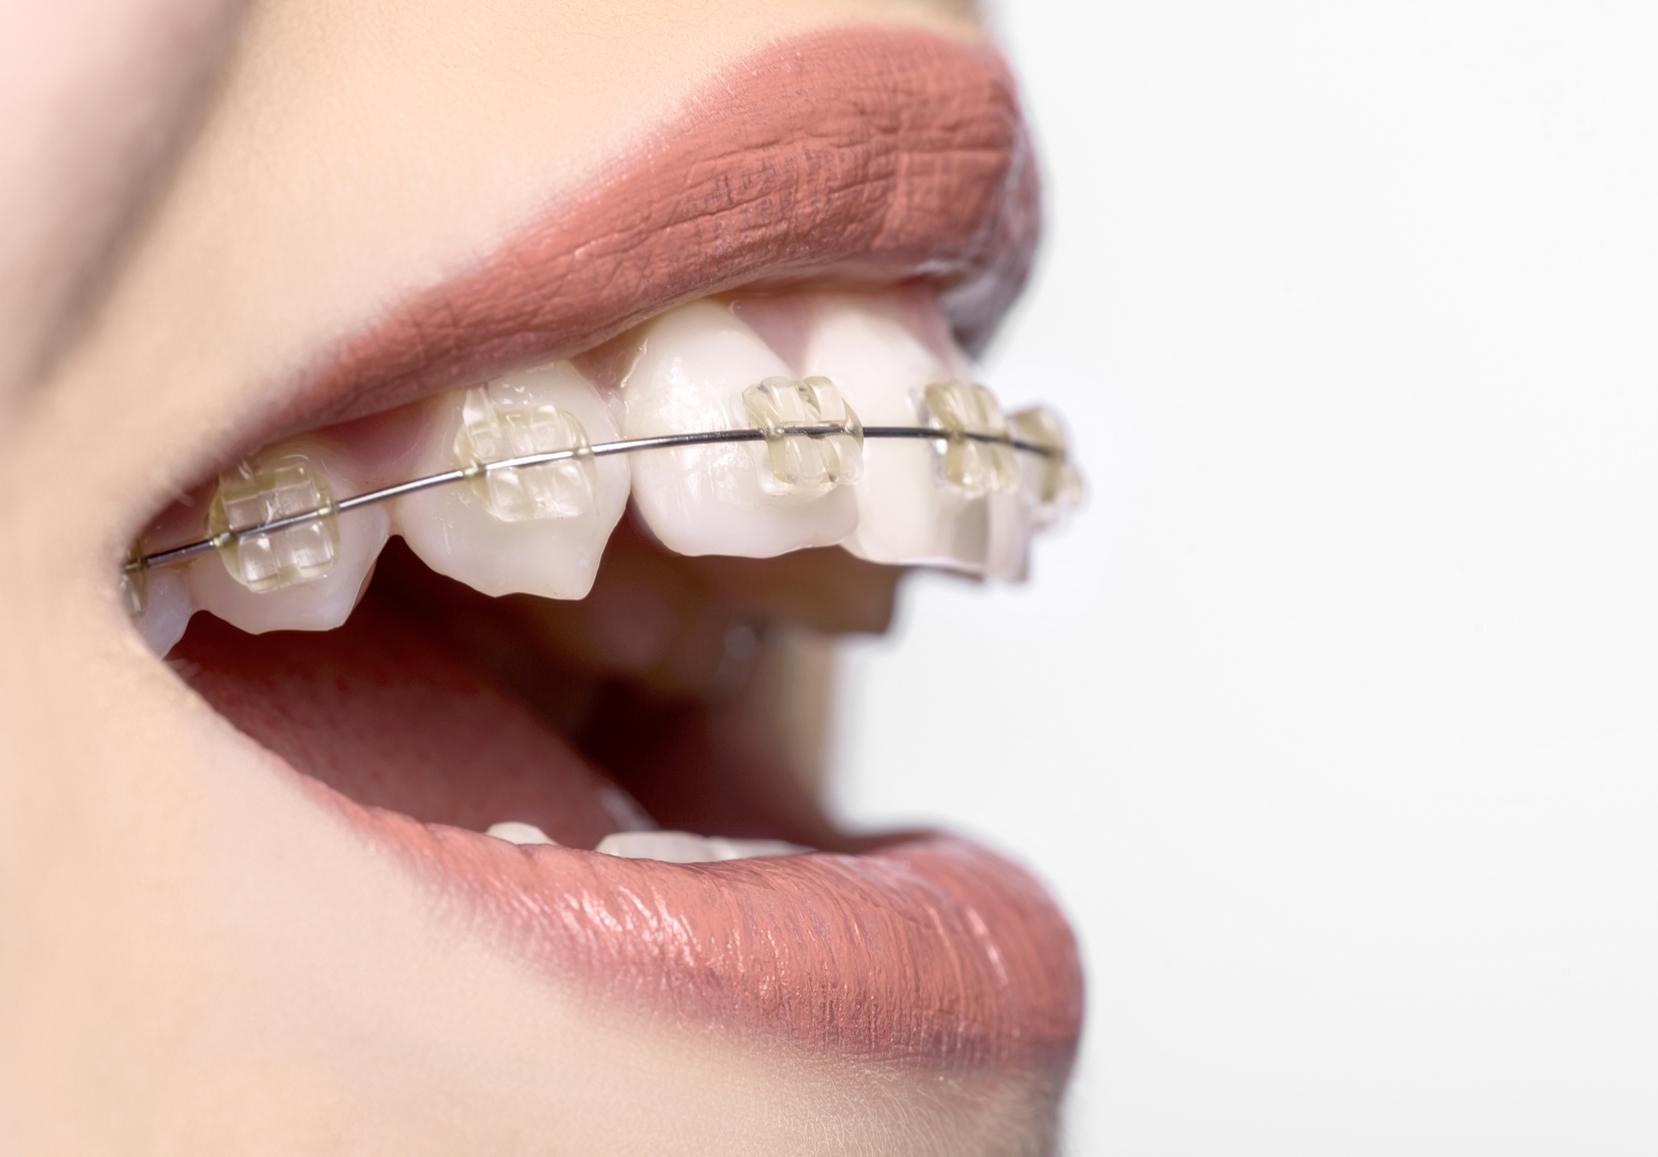 iStock 63907725 MEDIUM - ارتودنسي دندان يا سيم كشى دندان؟!